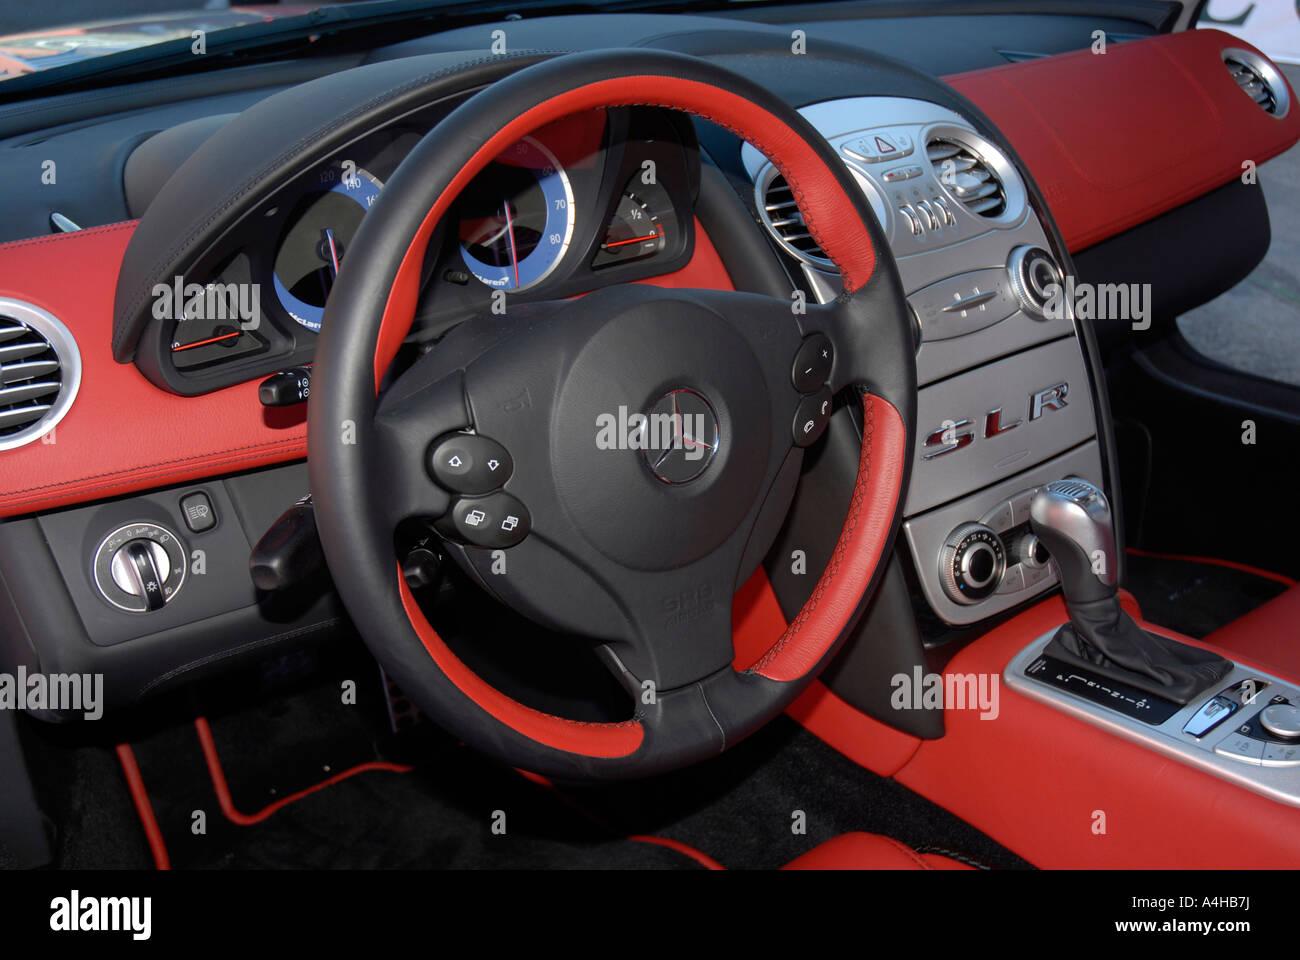 mclaren mercedes slr car interior stock photo: 11051909 - alamy